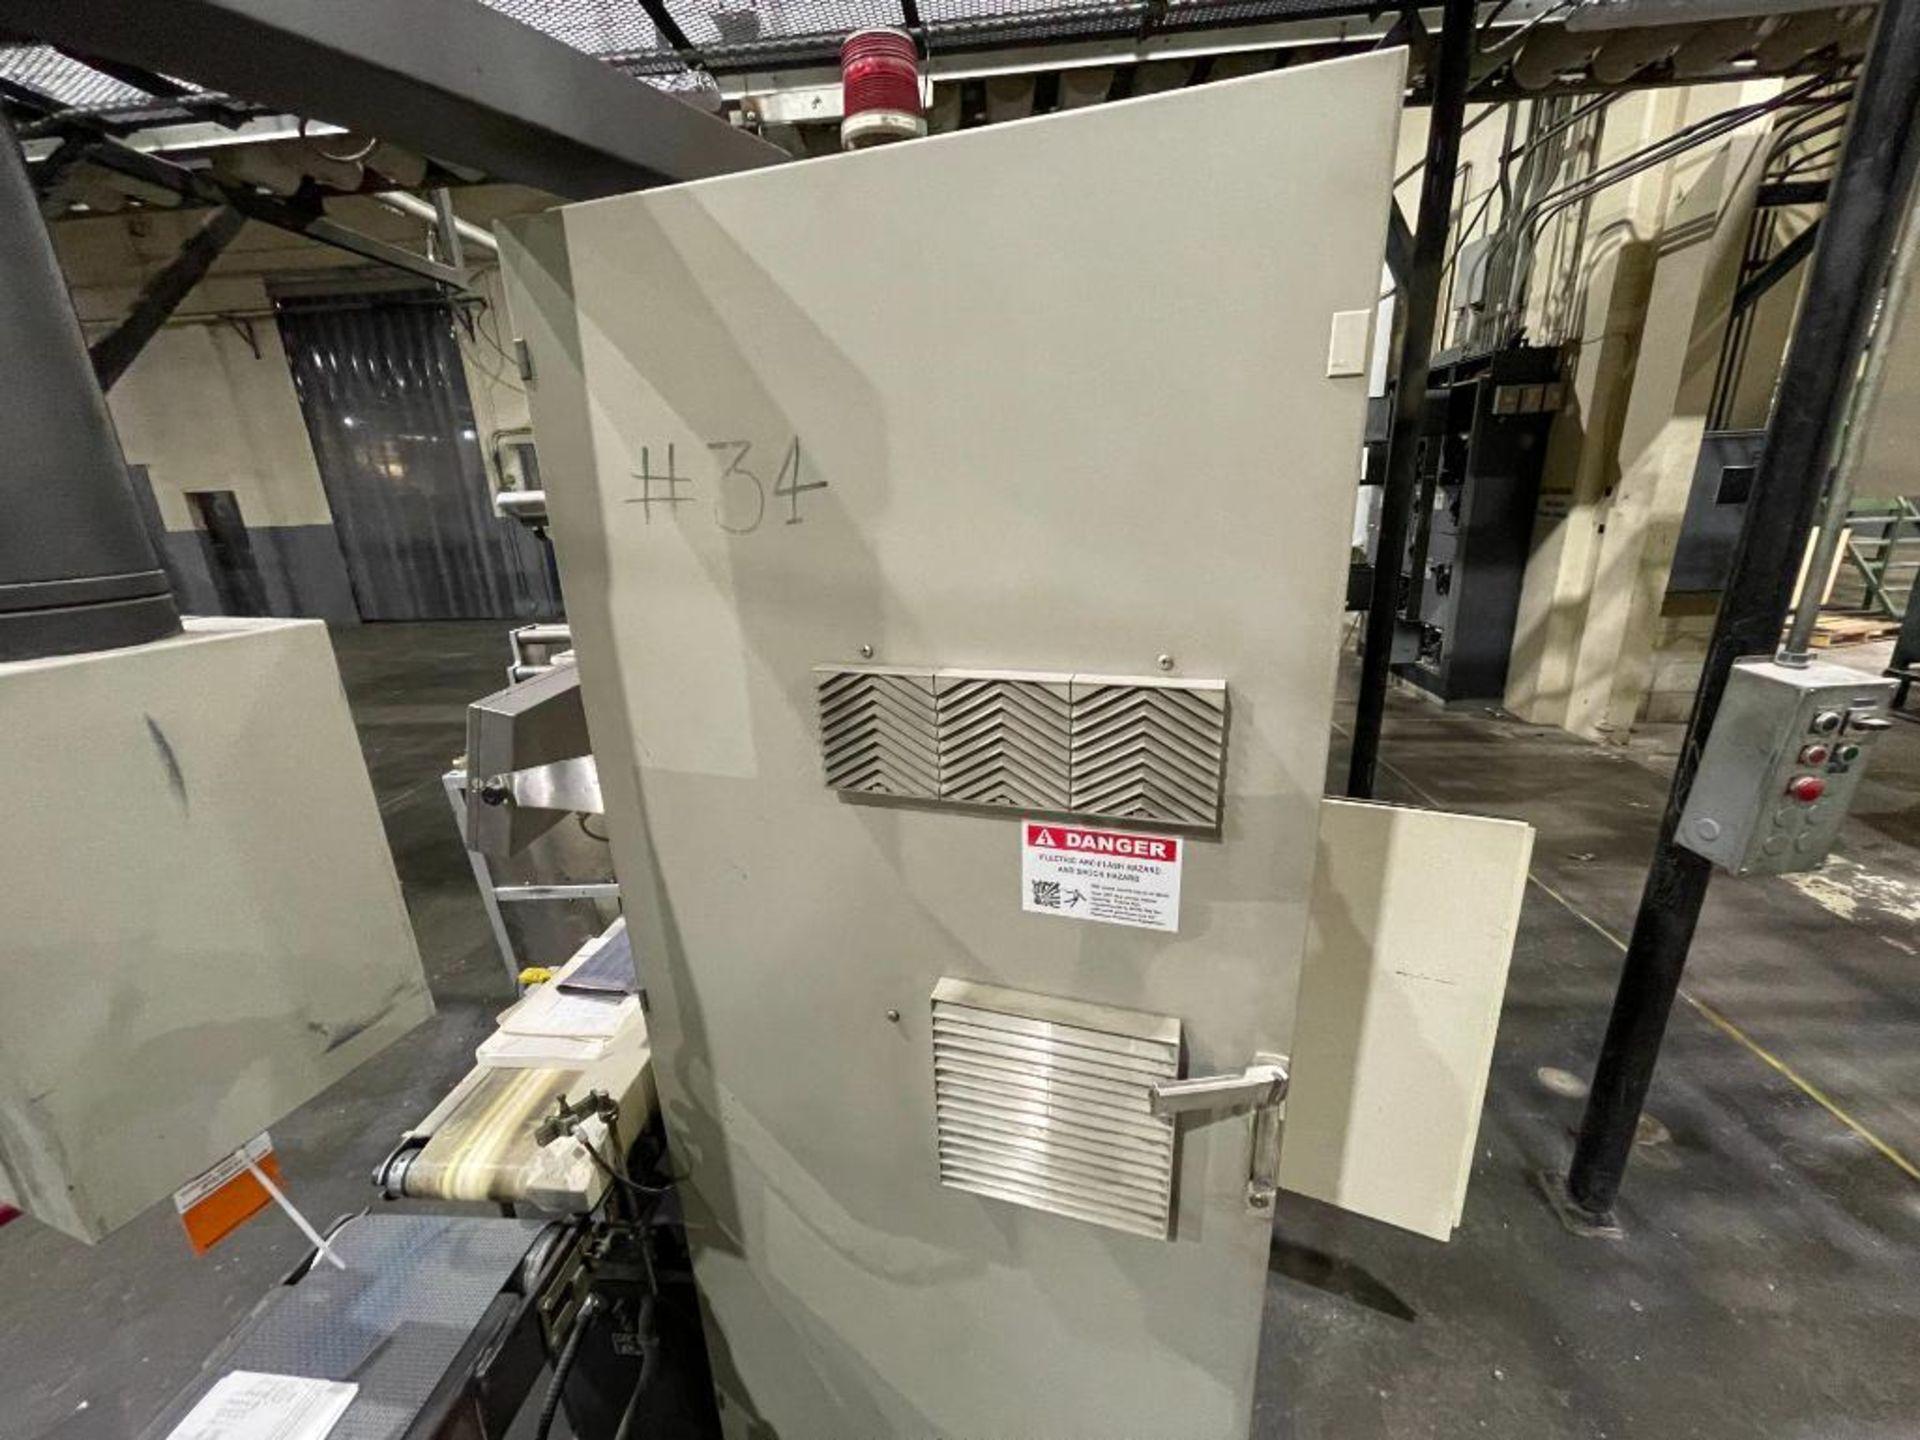 Stiavelli long goods horizontal flow wrapper - Image 45 of 53